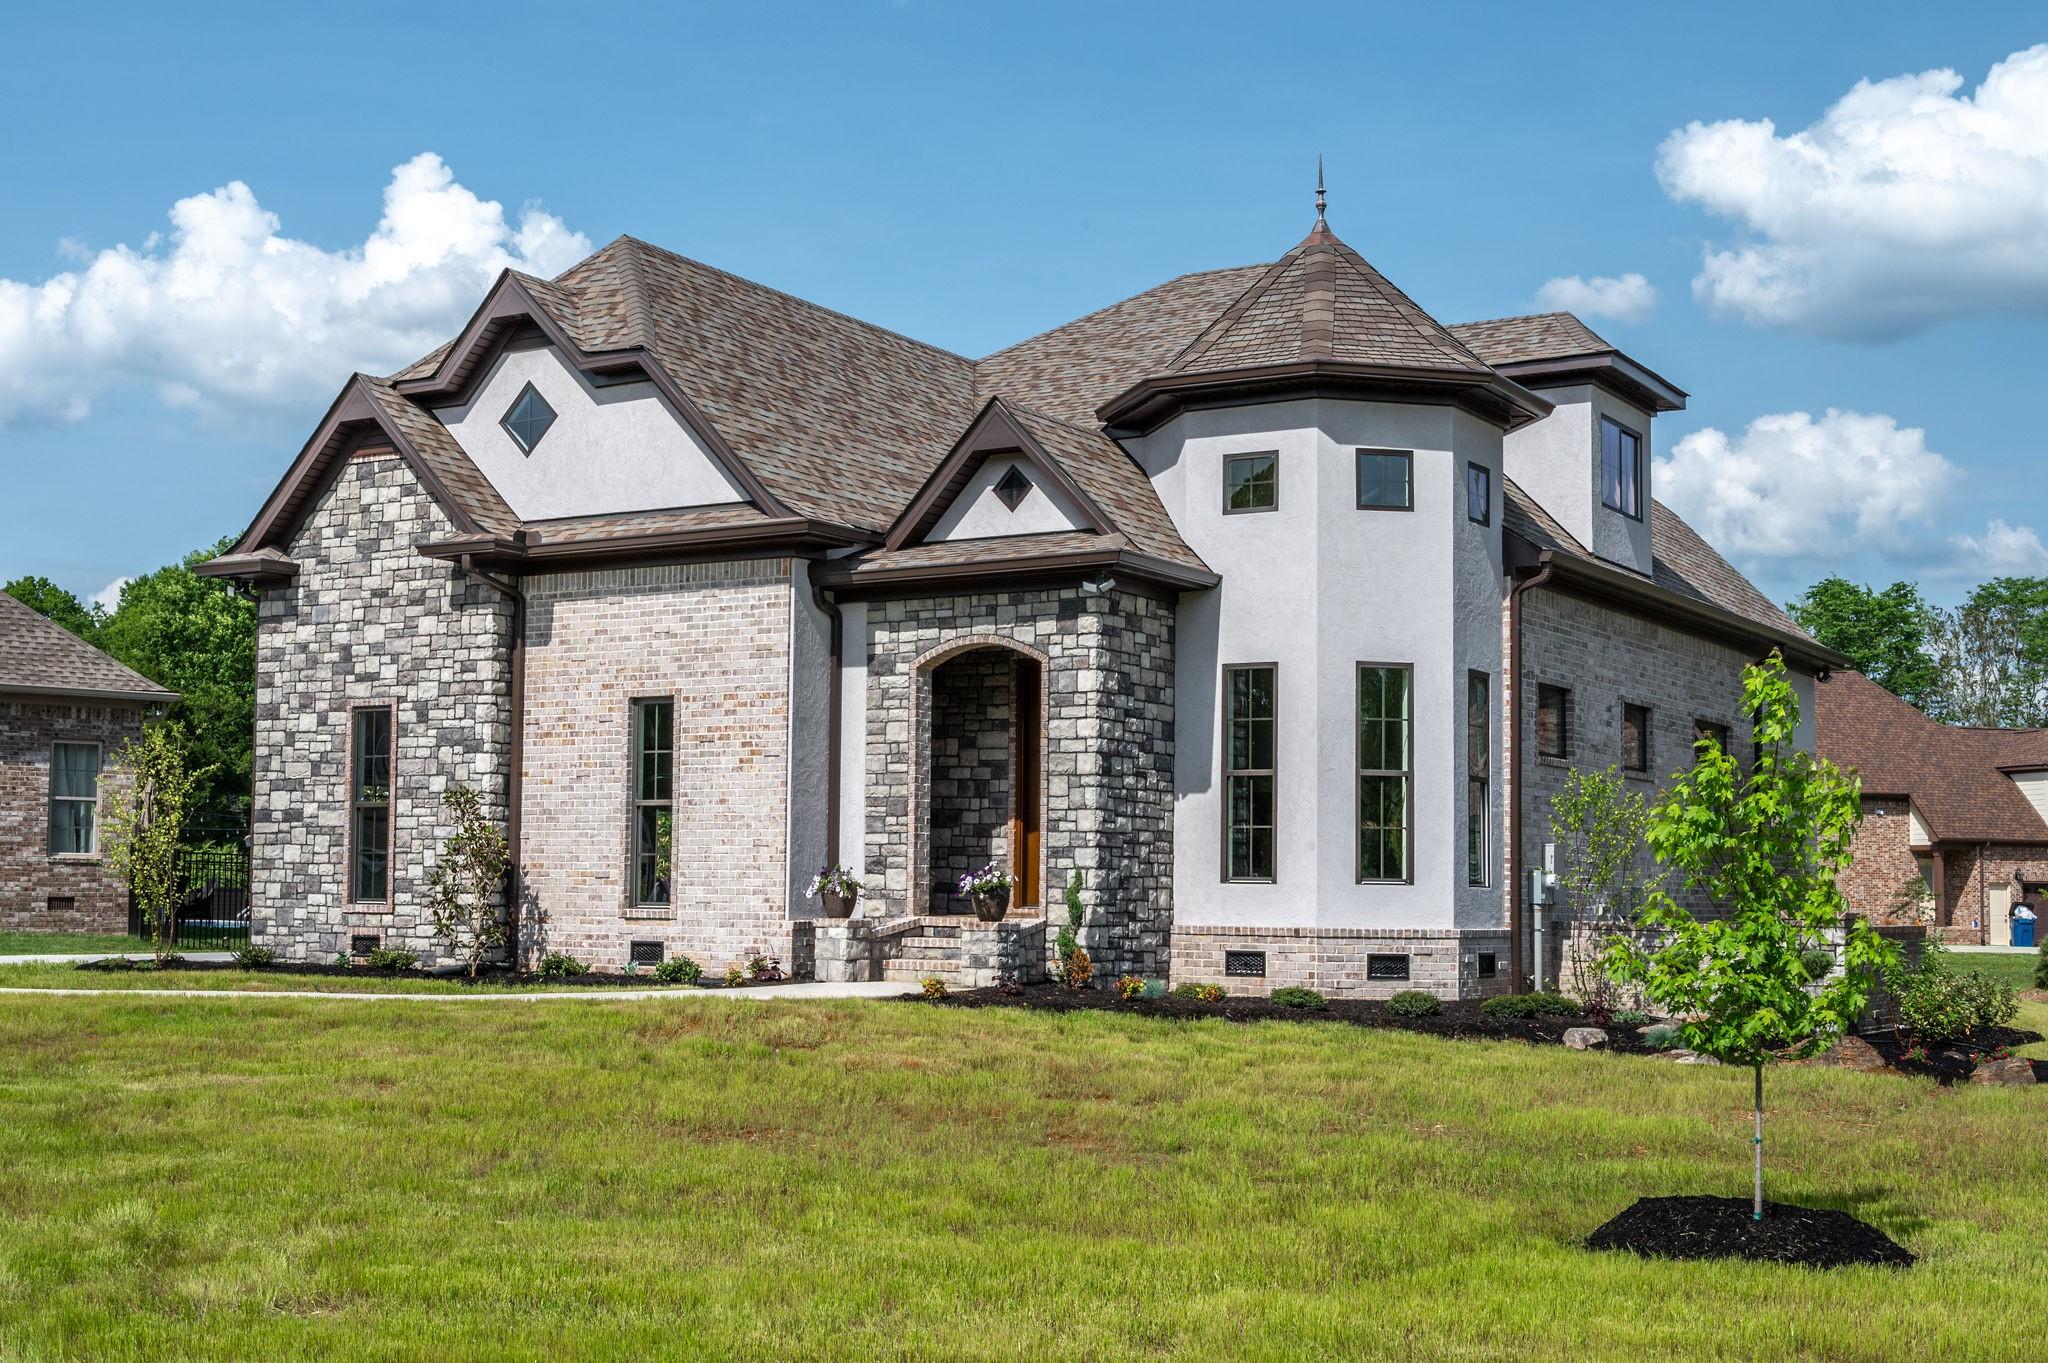 136 Rockingham Dr Property Photo - Murfreesboro, TN real estate listing